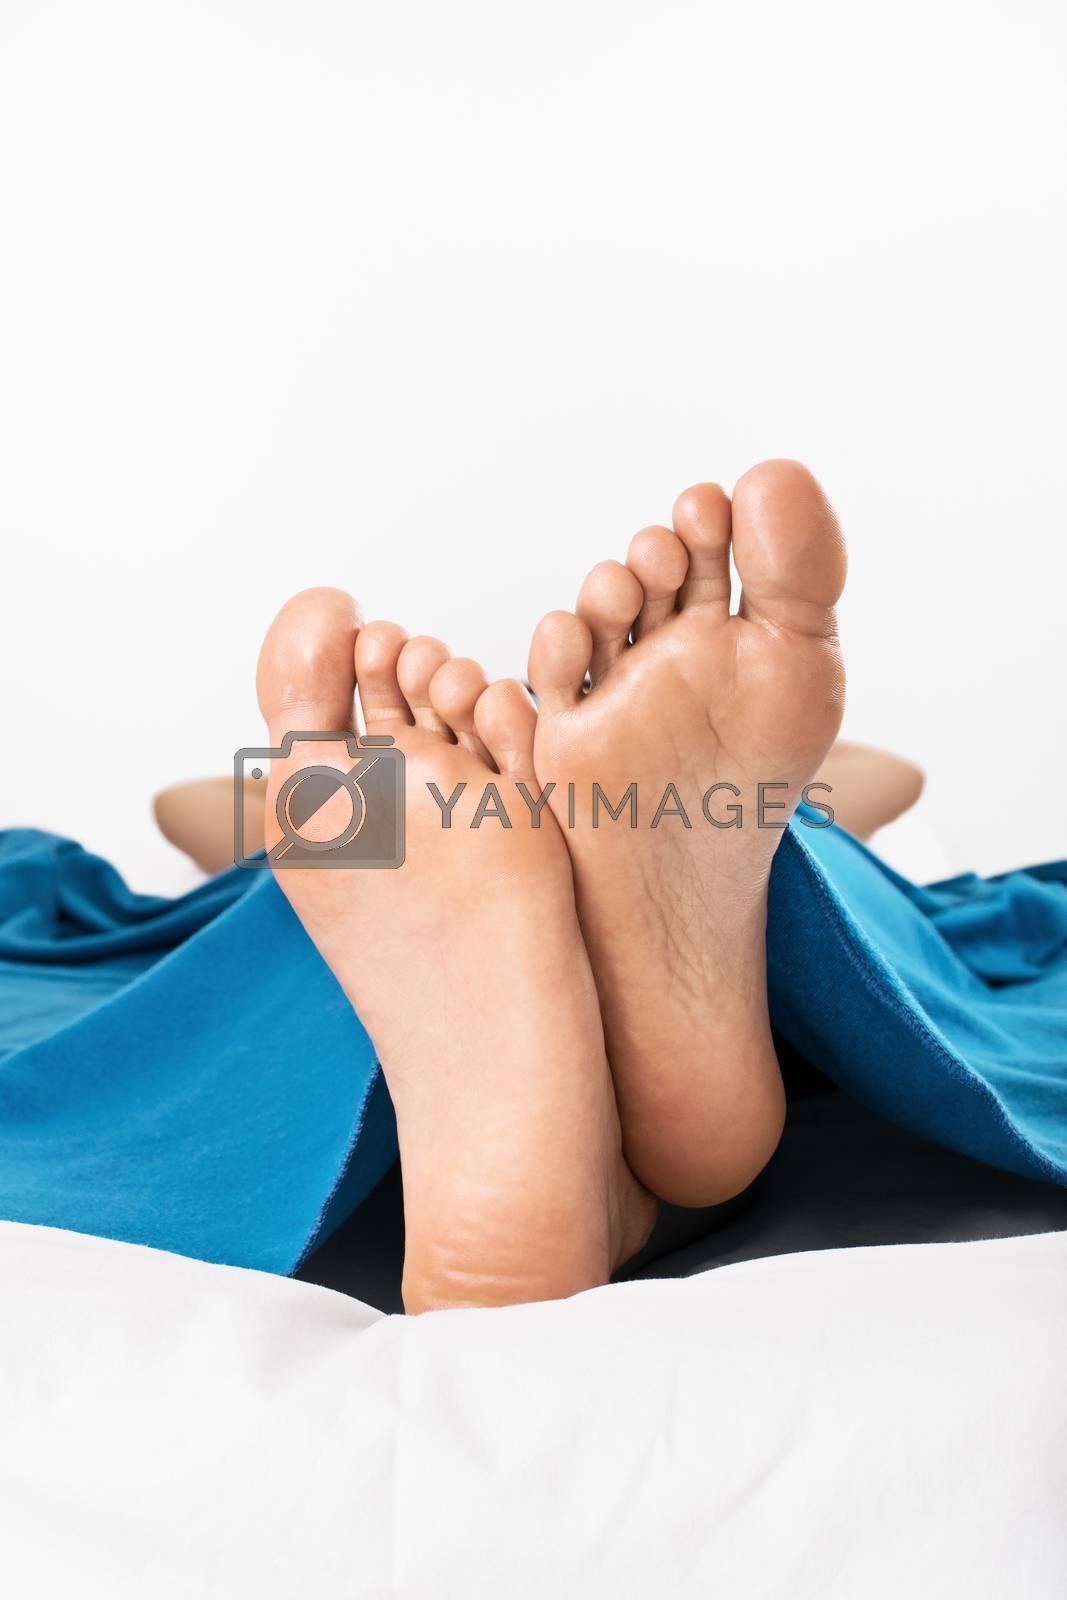 Feet up, relaxing by Mendelex